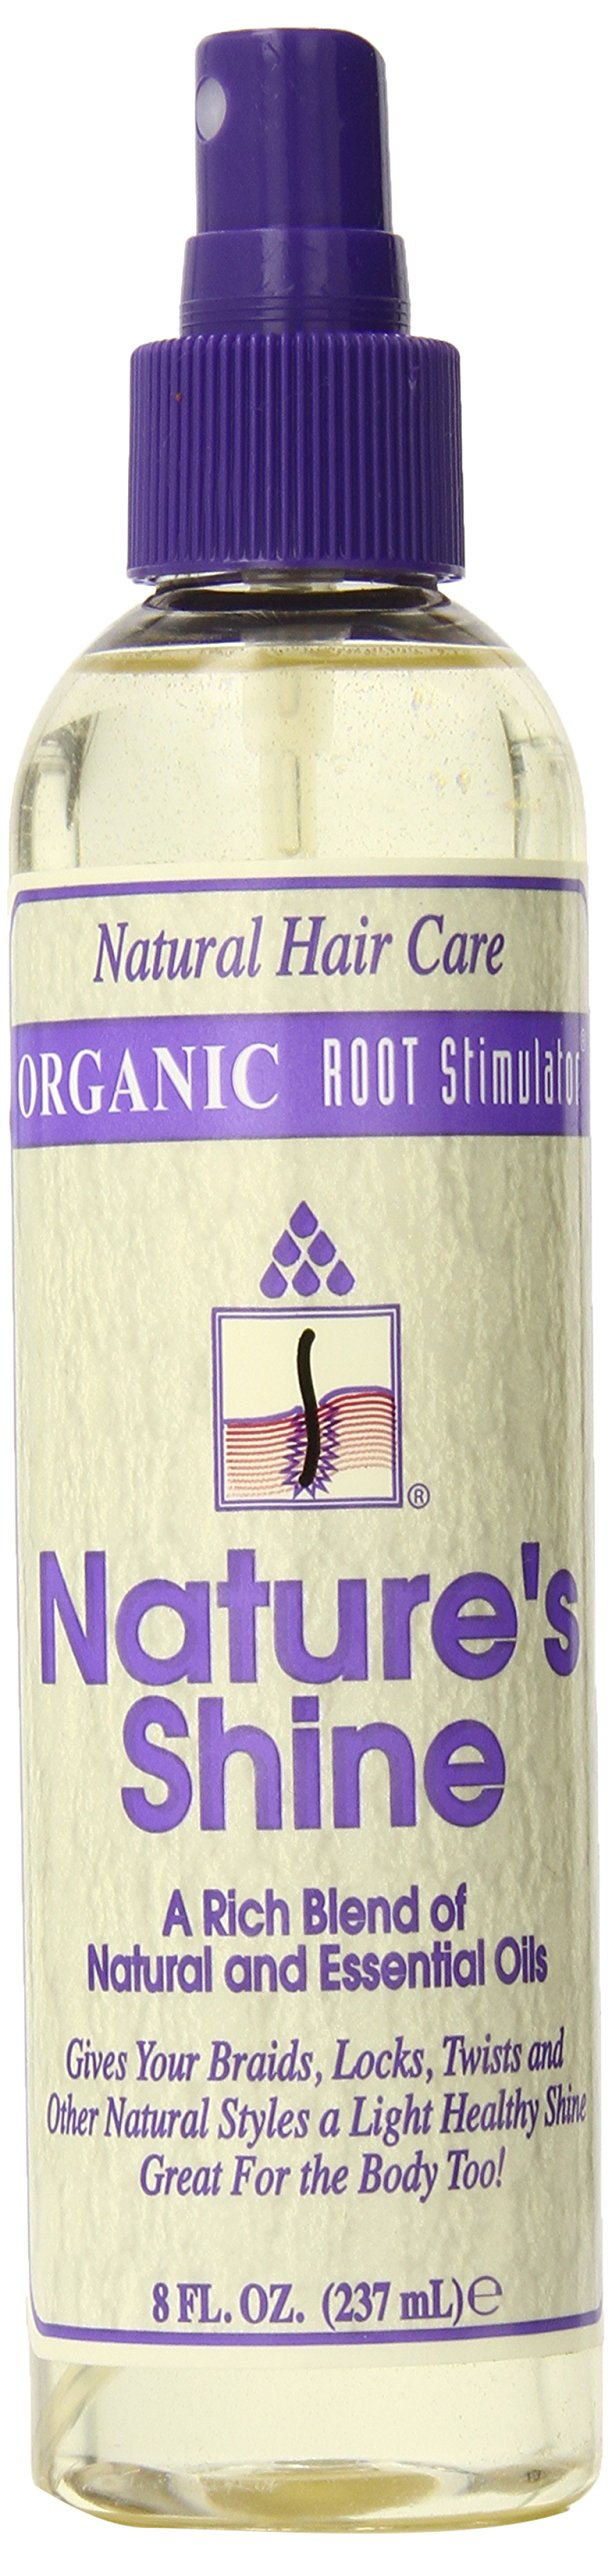 Amazon.com: Organic Root Stimulator Herbal Cleanse Dry